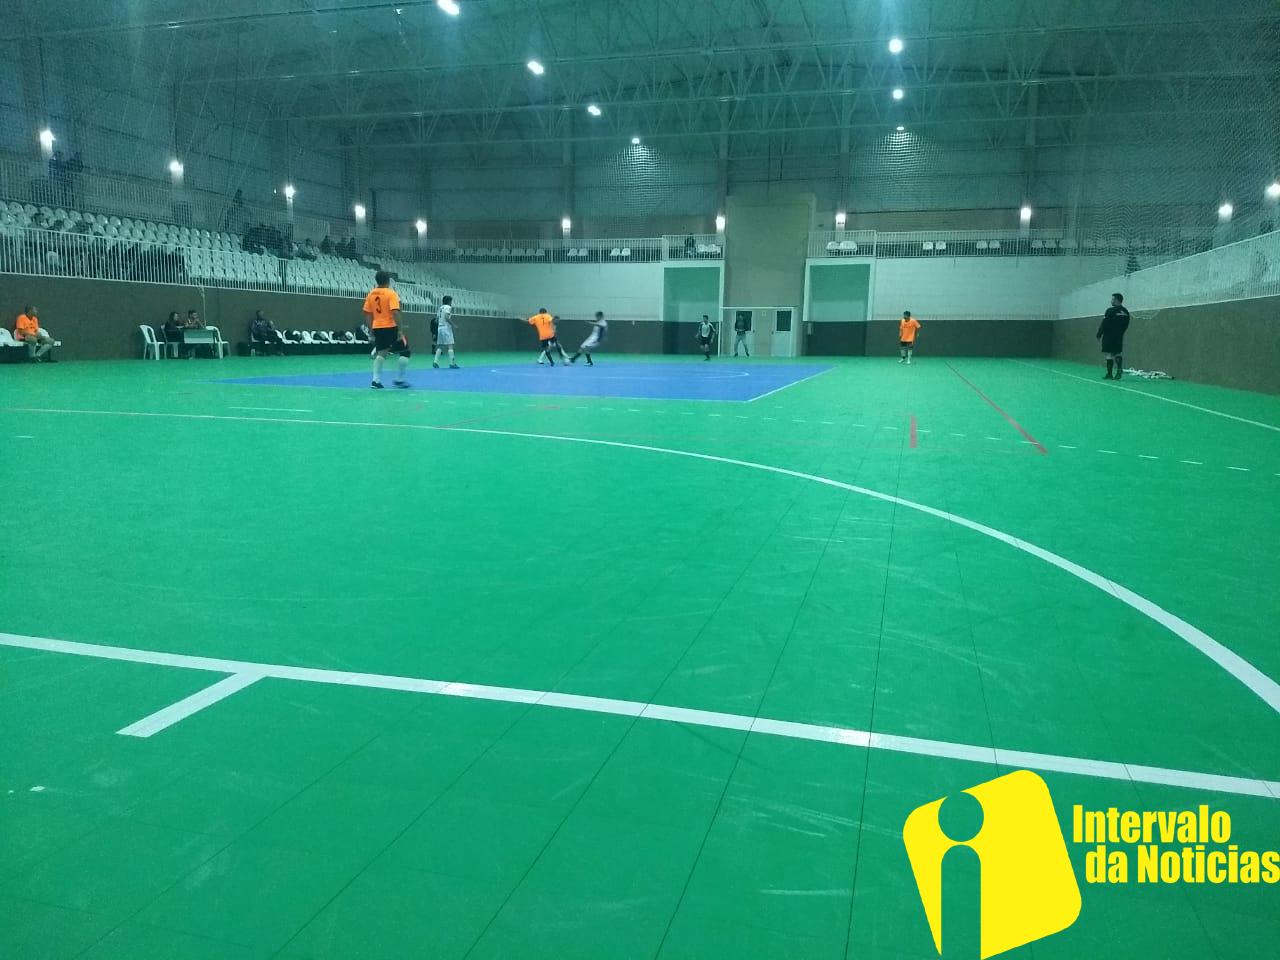 59c25c1060 ... finalistas da 2ª Divisão do Campeonato Futsal Rural de Prudentópolis